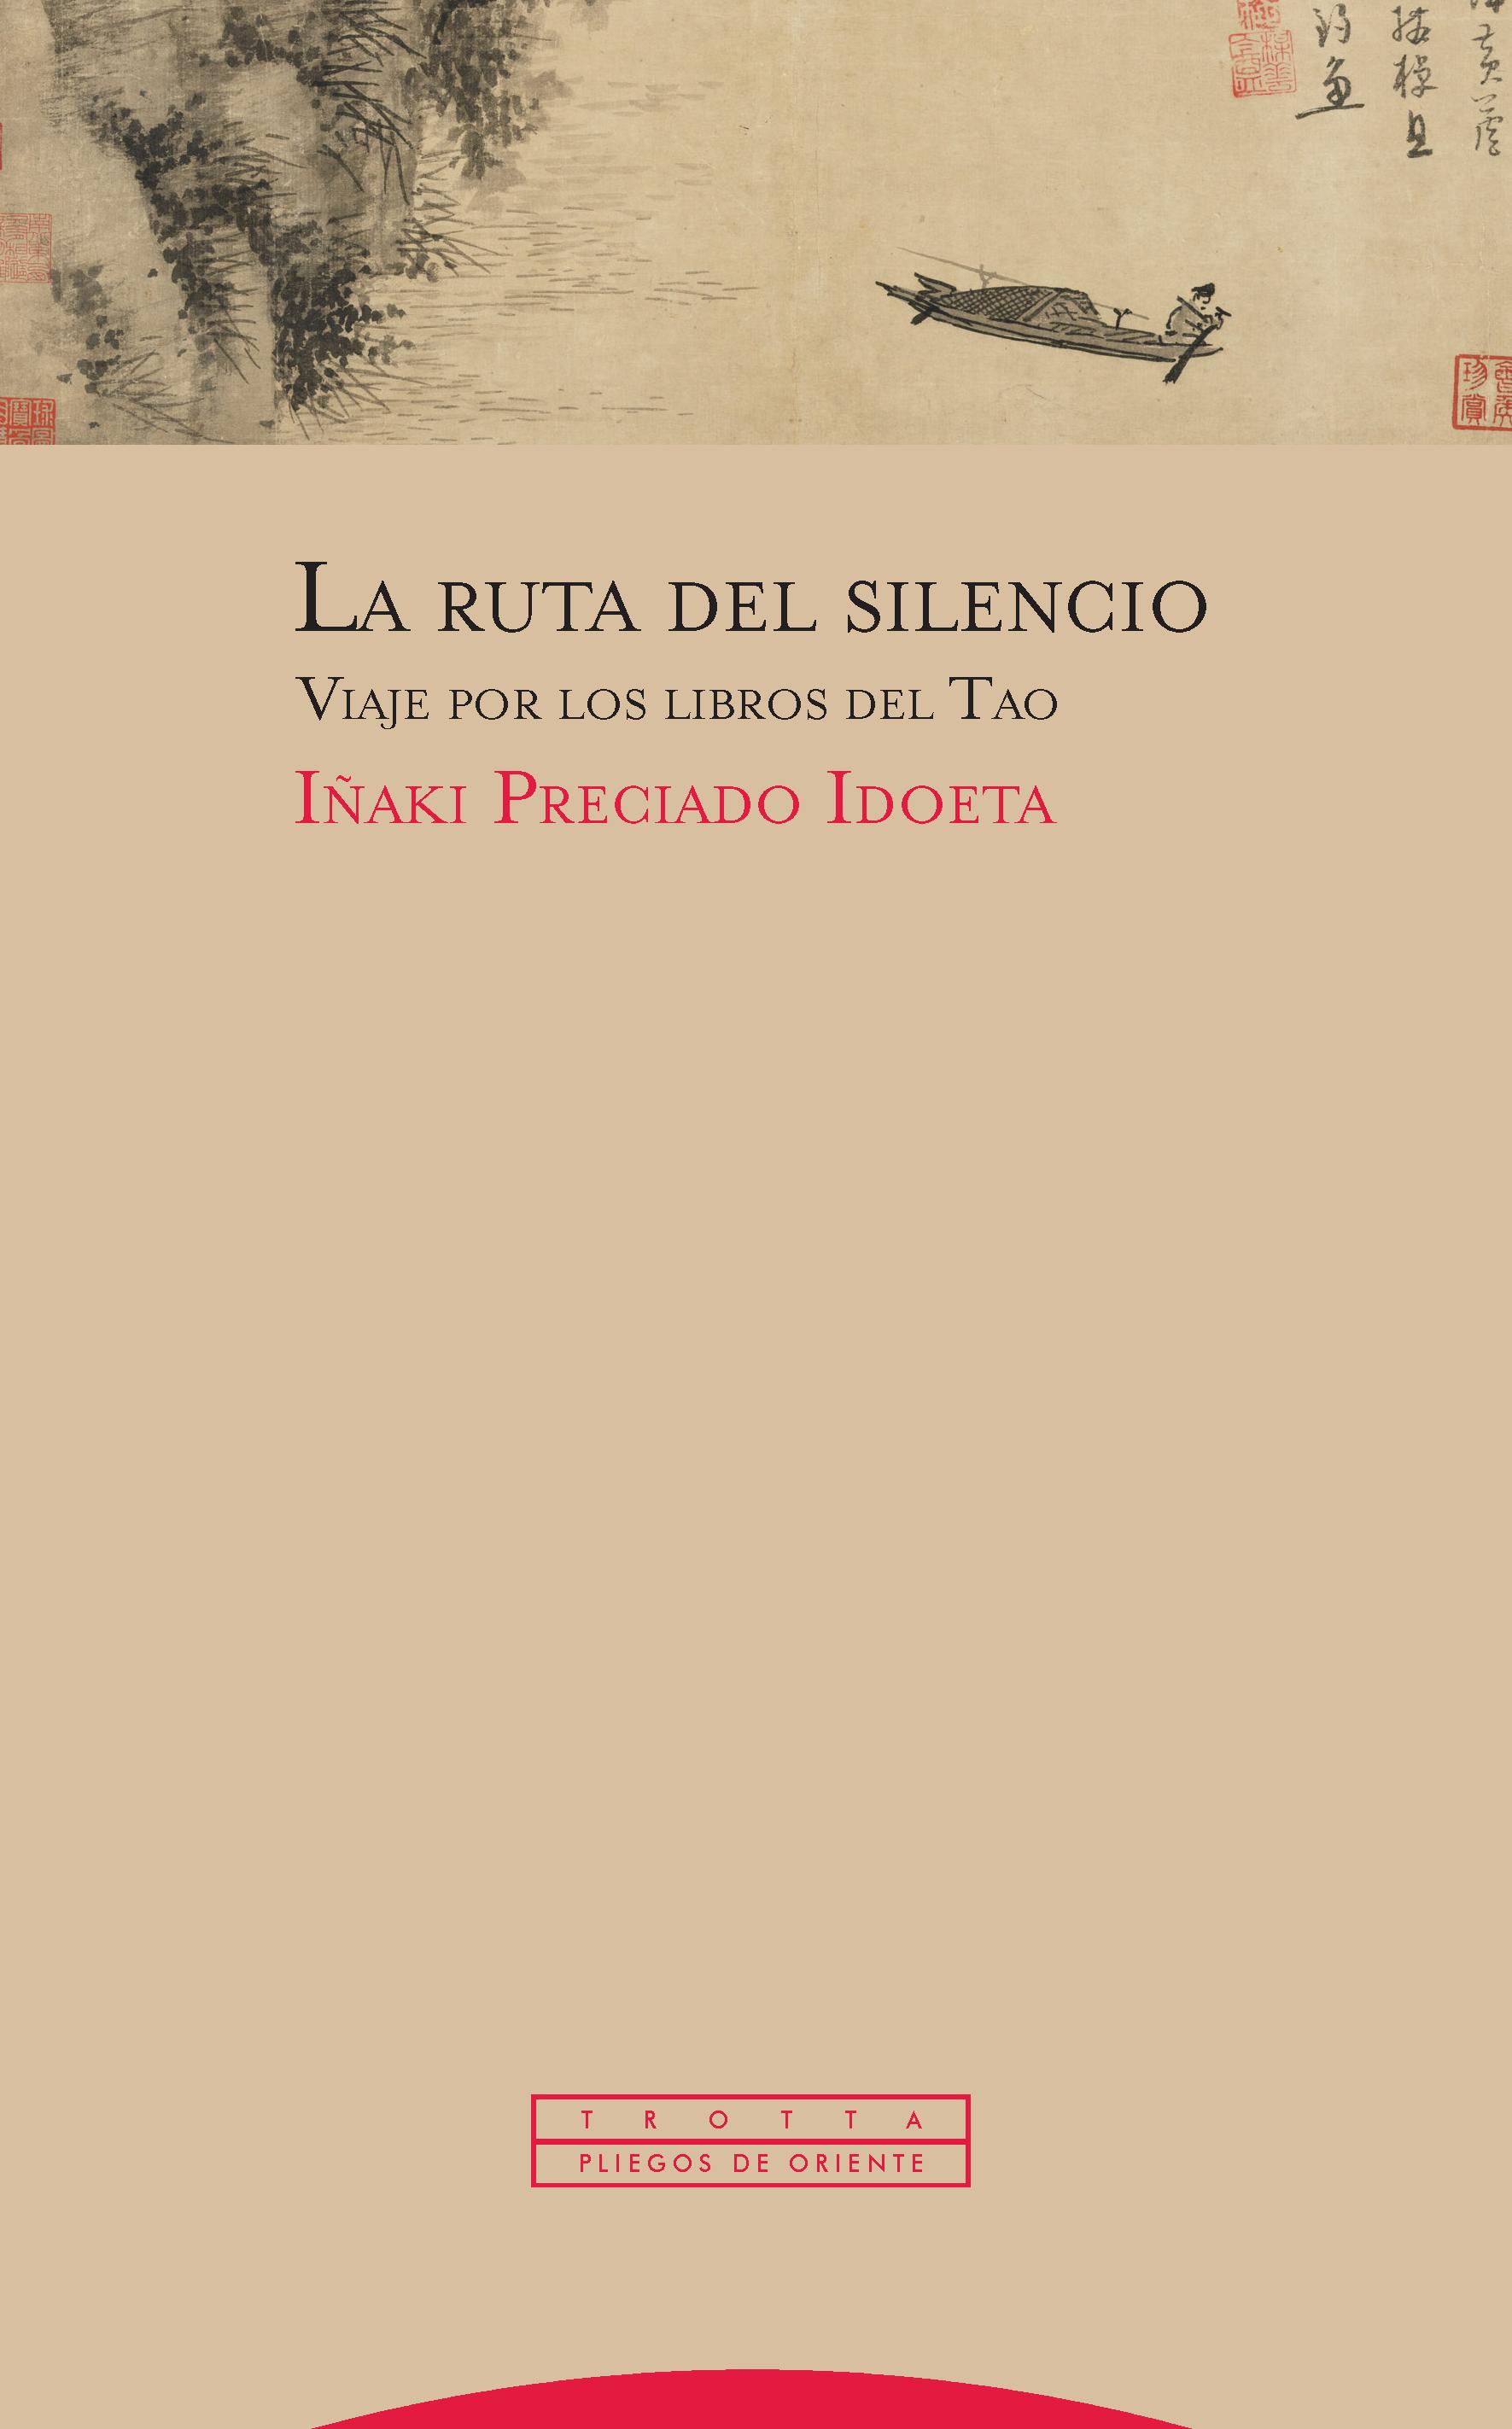 Ruta del silencio, La